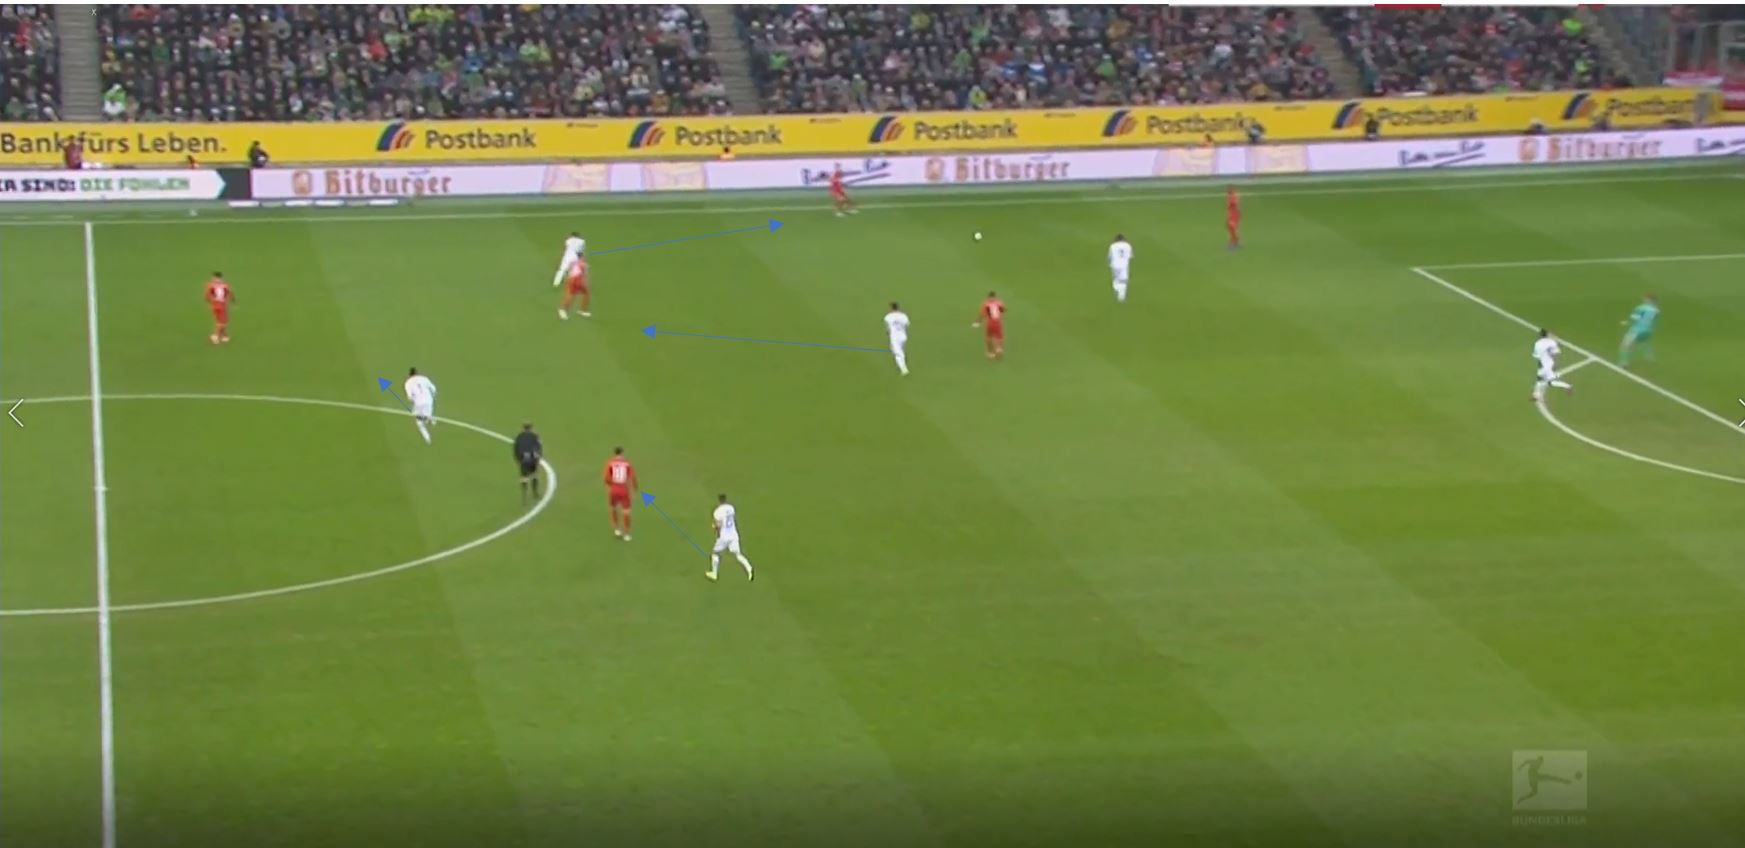 Bundesliga 2019/20: Borussia Monchengladbach vs Bayern Munich- tactical analysis tactics